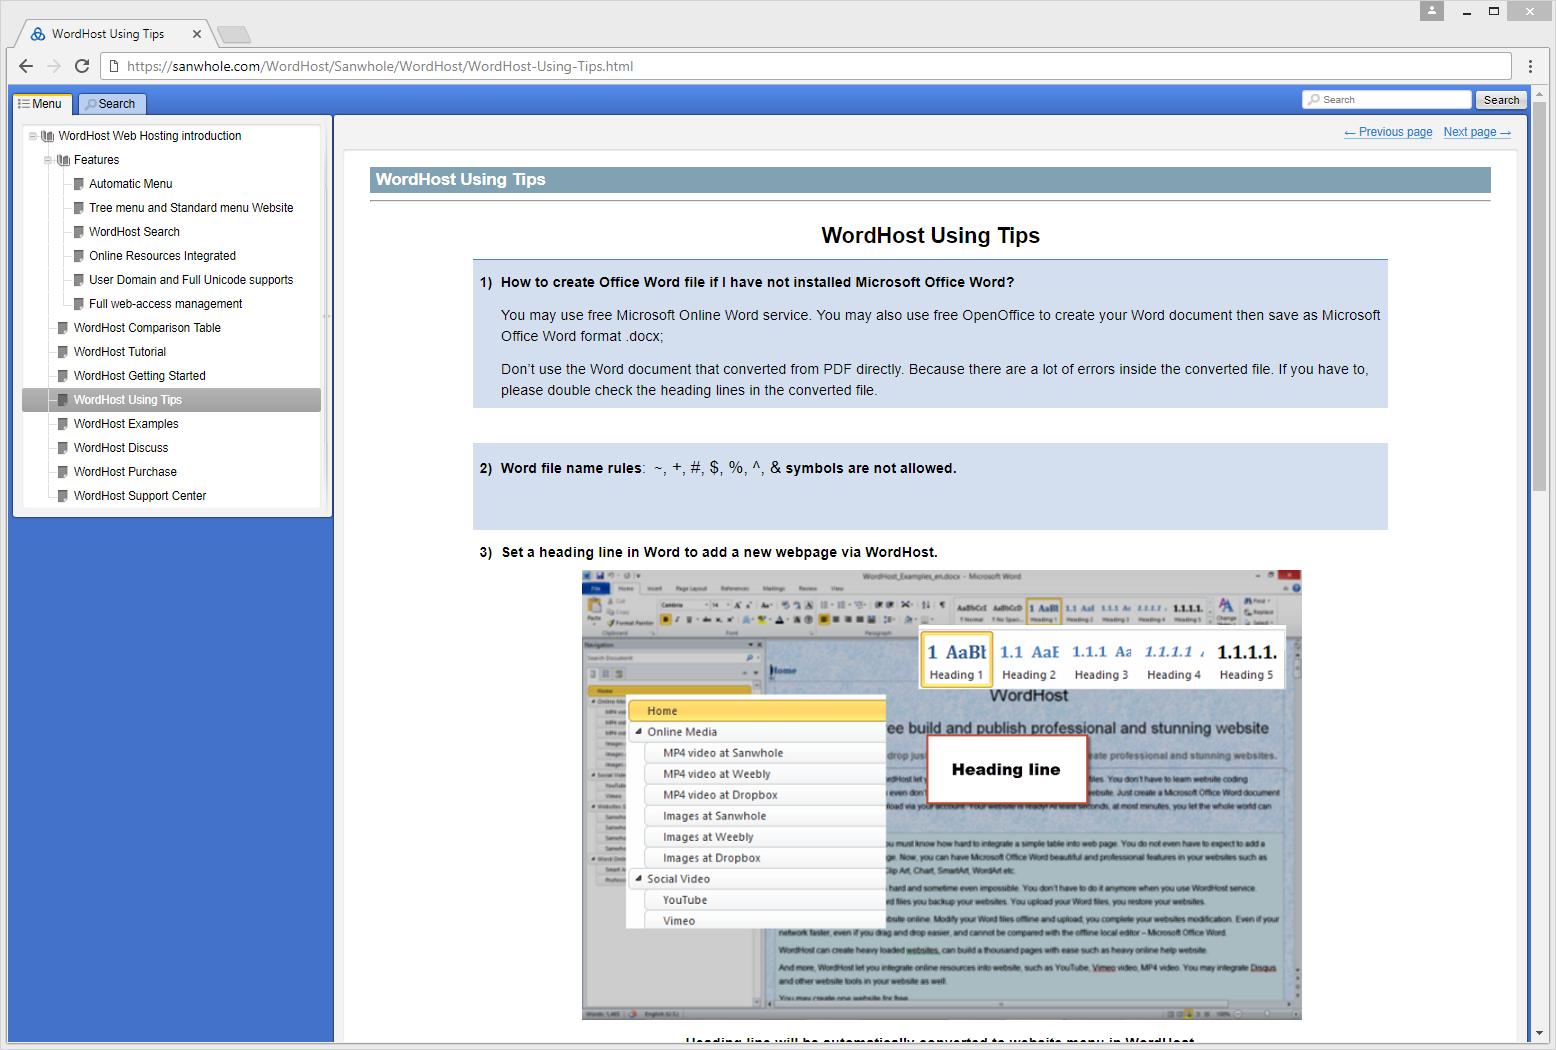 PageShare Web Hosting 10 - 10 websites 1 year web hosting Screenshot 13